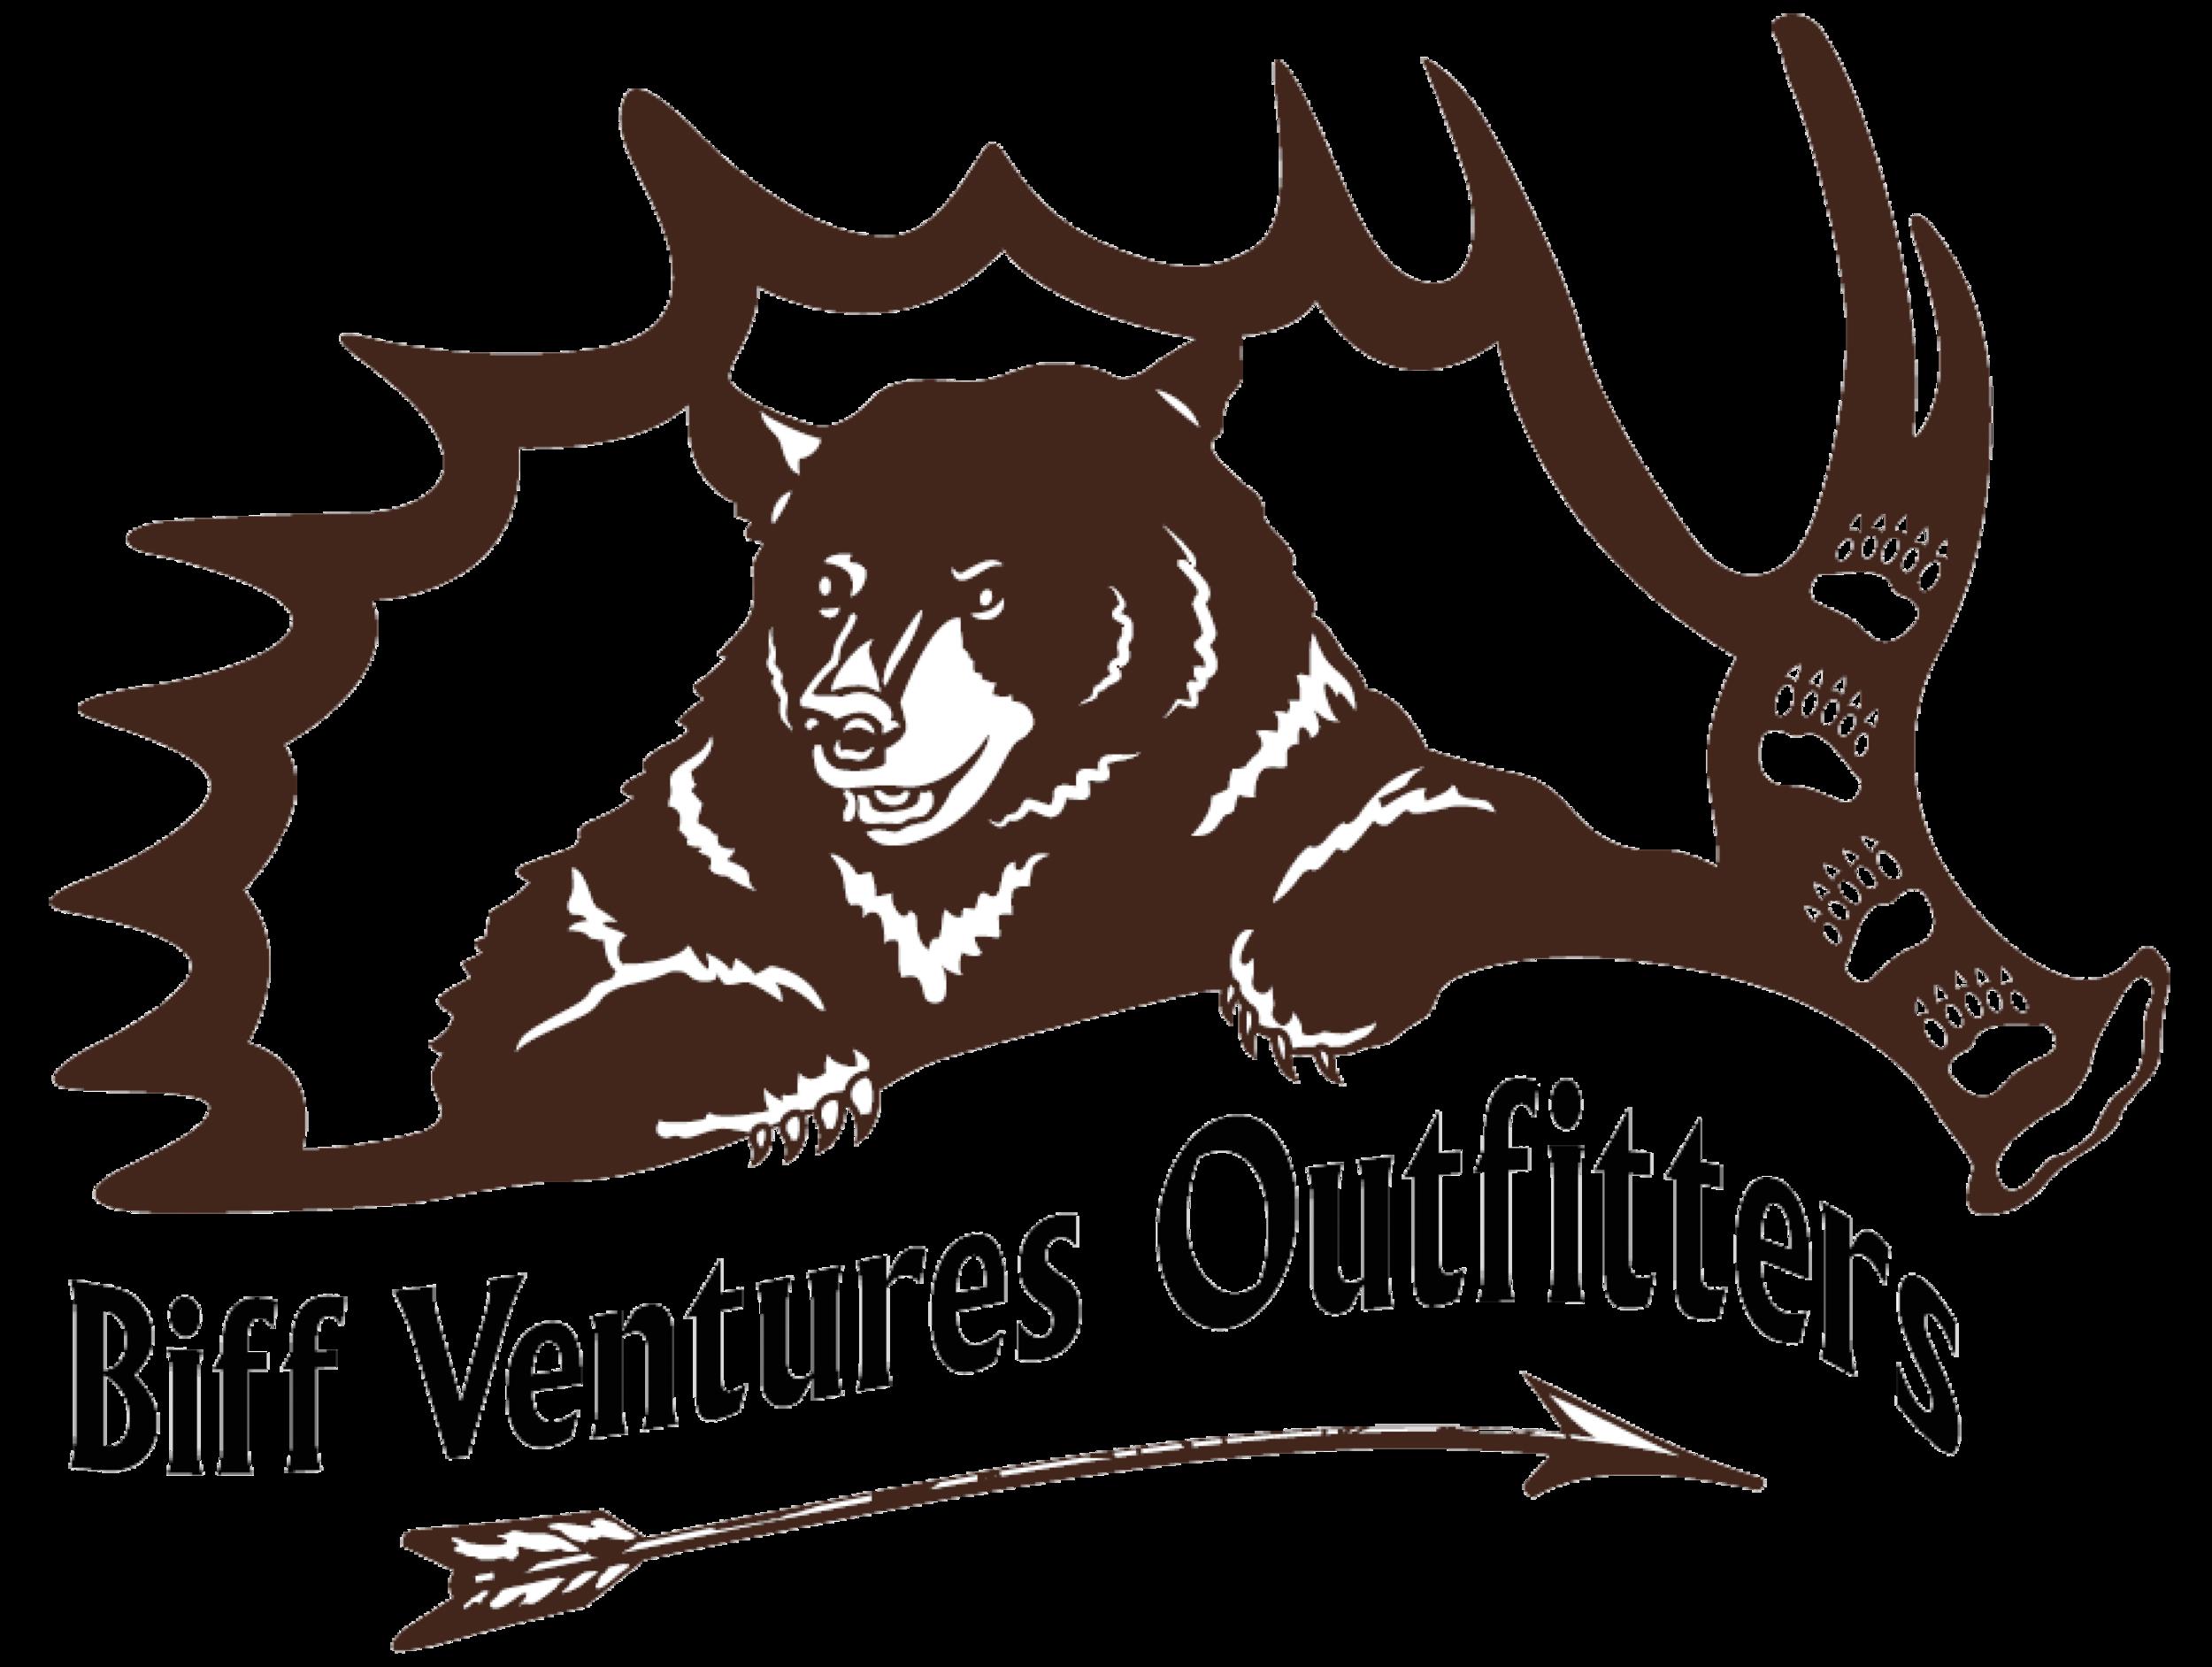 Biff Ventures logo image.png